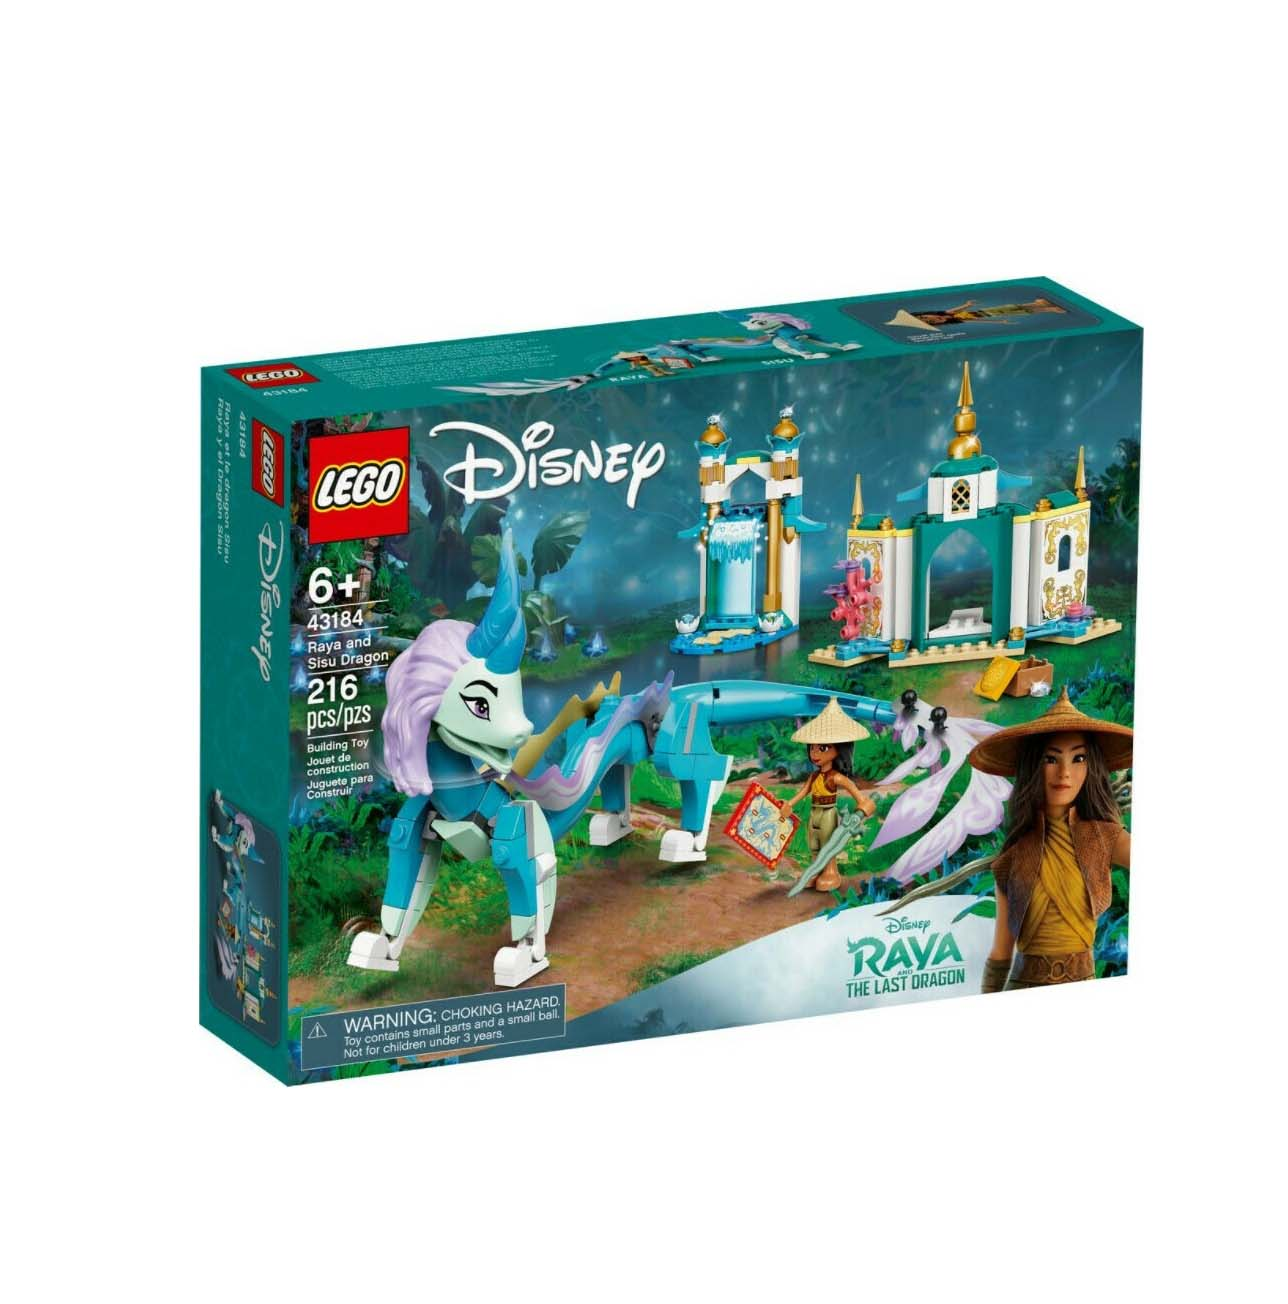 Lego Disney: Princess Raya and Sisu Dragon 43184